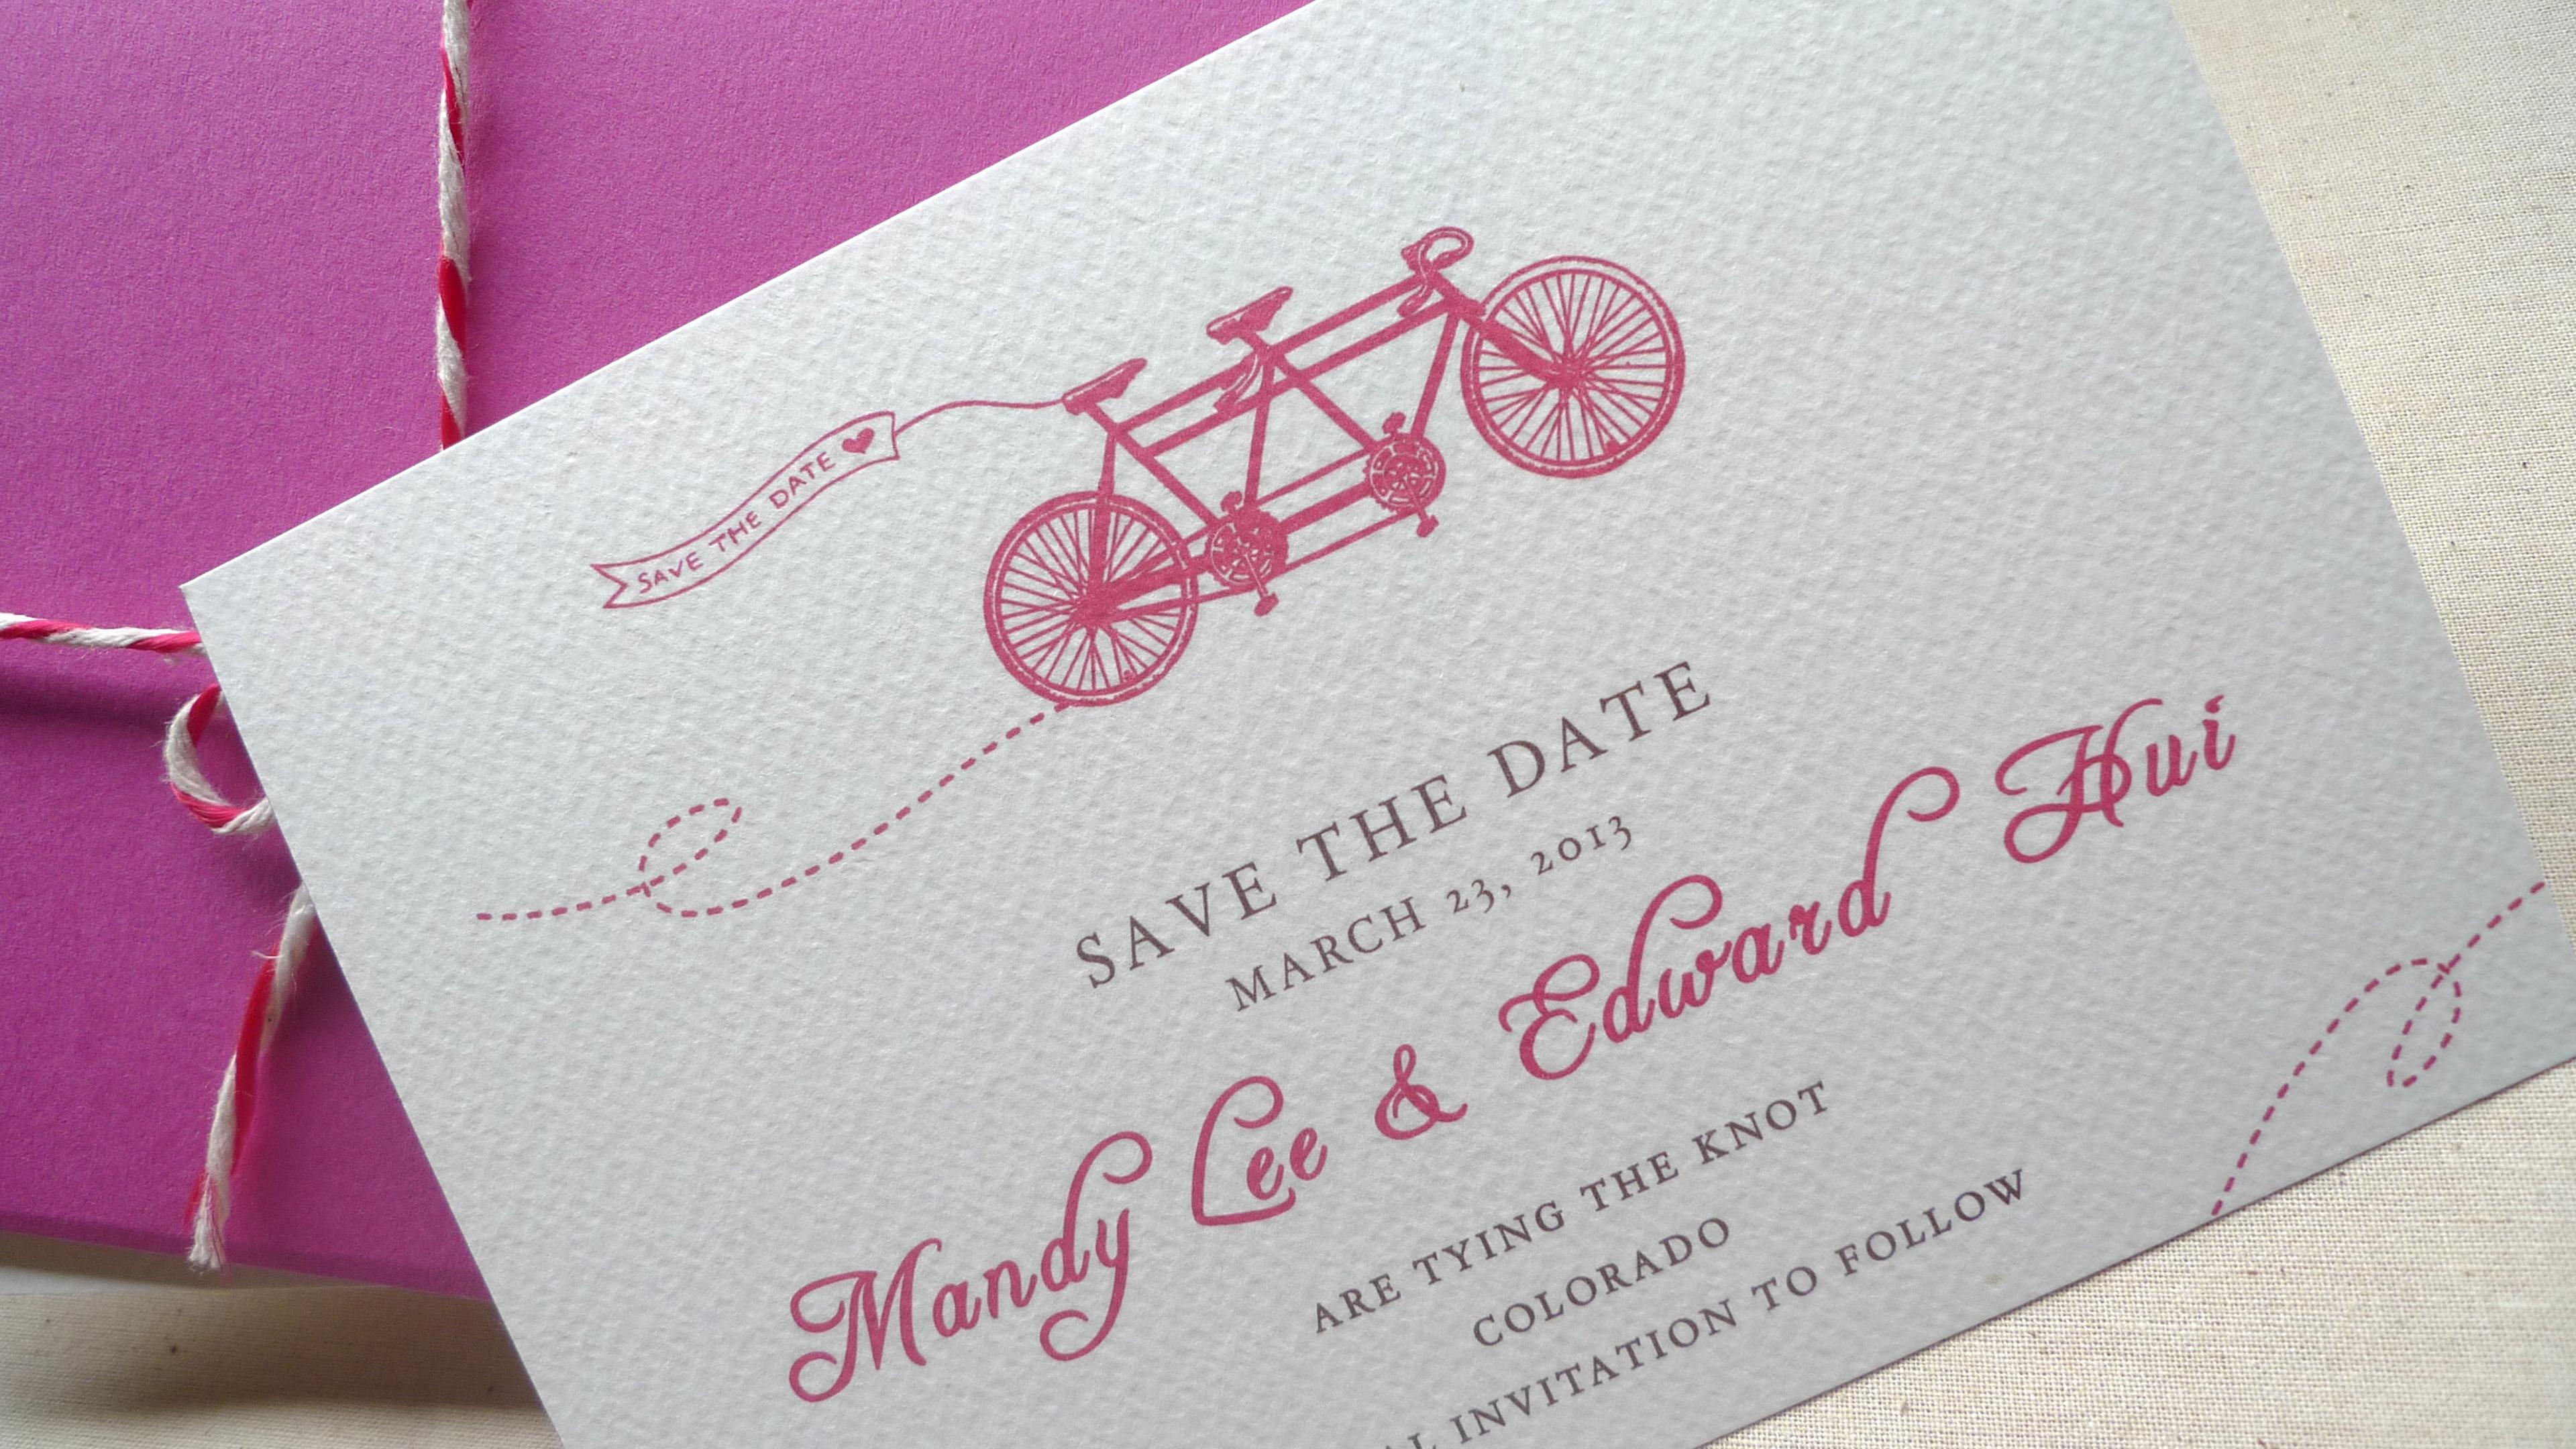 Ka Lo Chu - Spring Ride Wedding Invitation